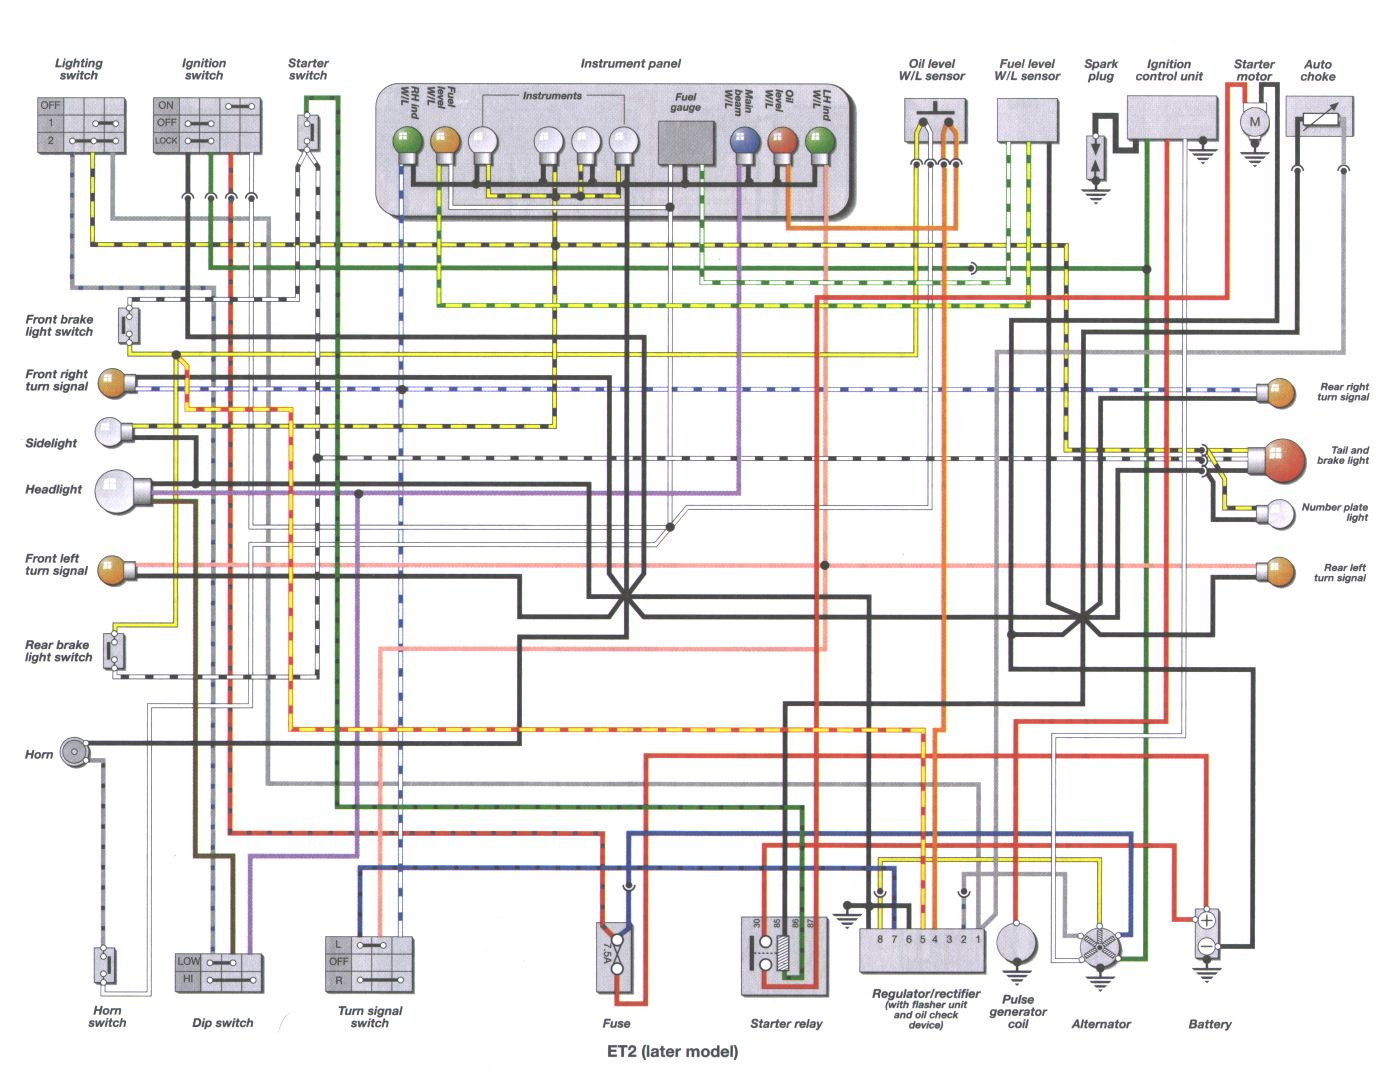 Diagram  Tomos Nitro 50 Wiring Diagram Full Version Hd Quality Wiring Diagram